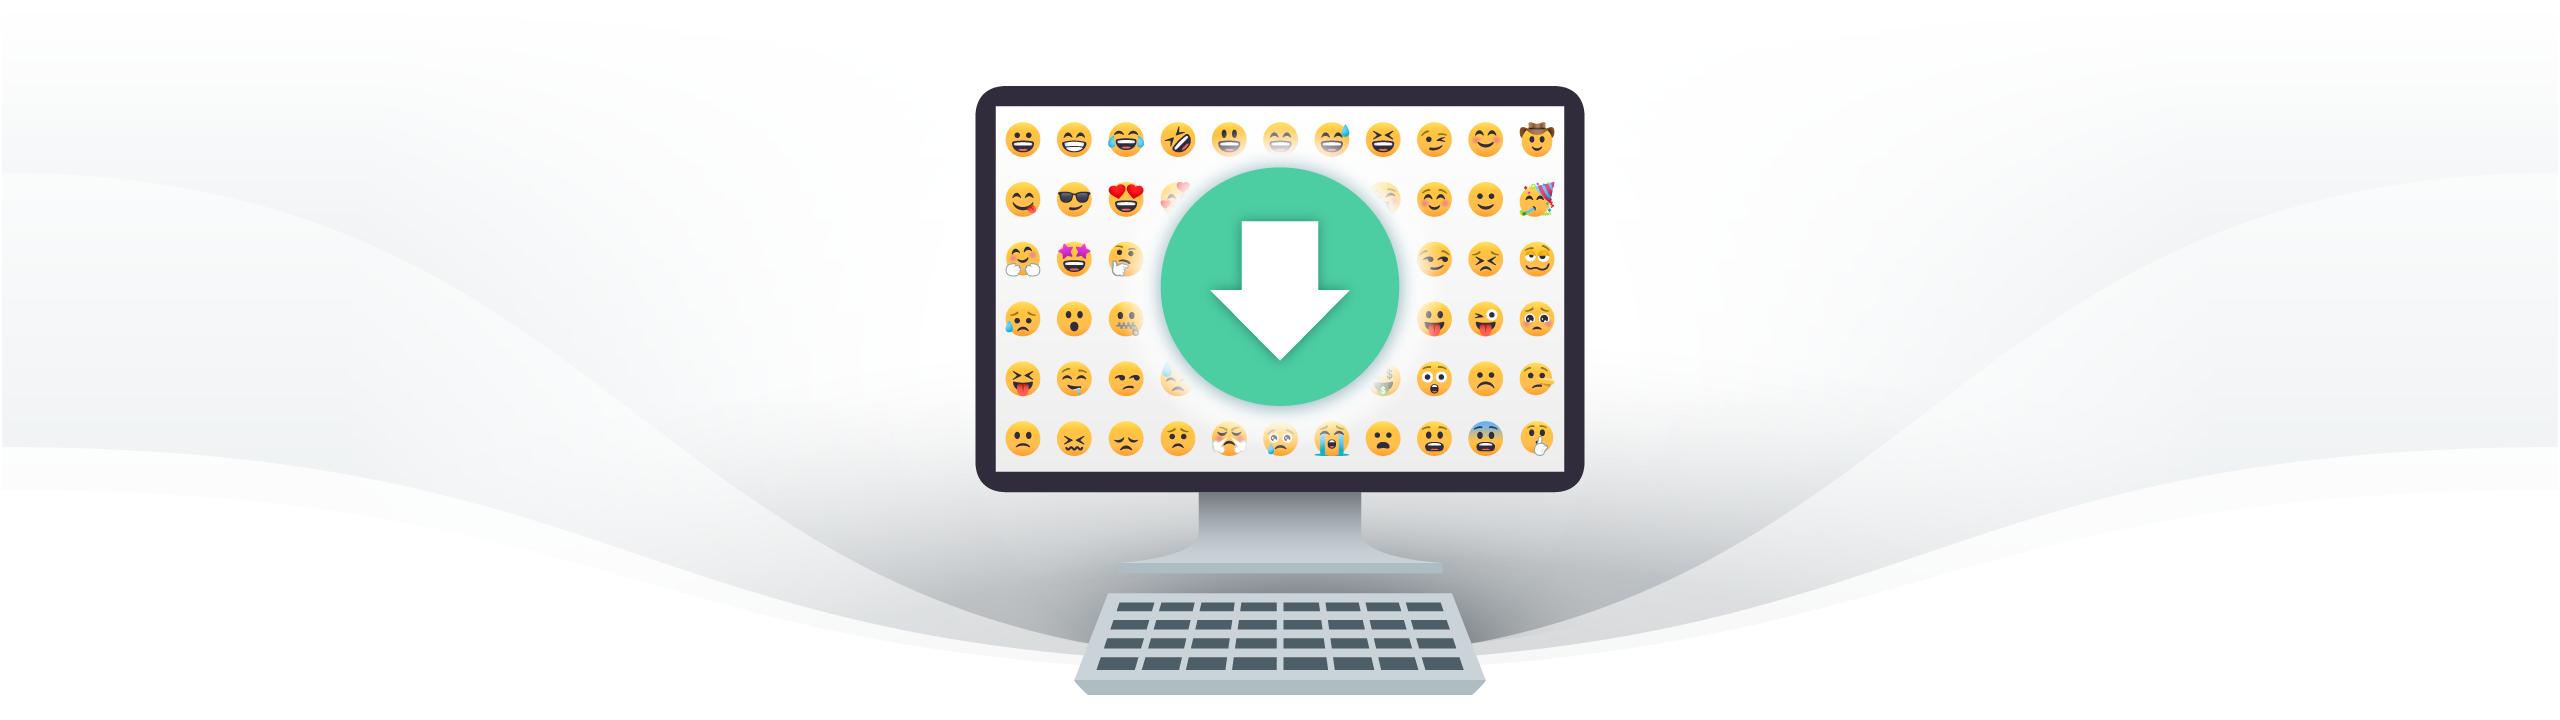 JoyPixels | Emoji Icons Downloads